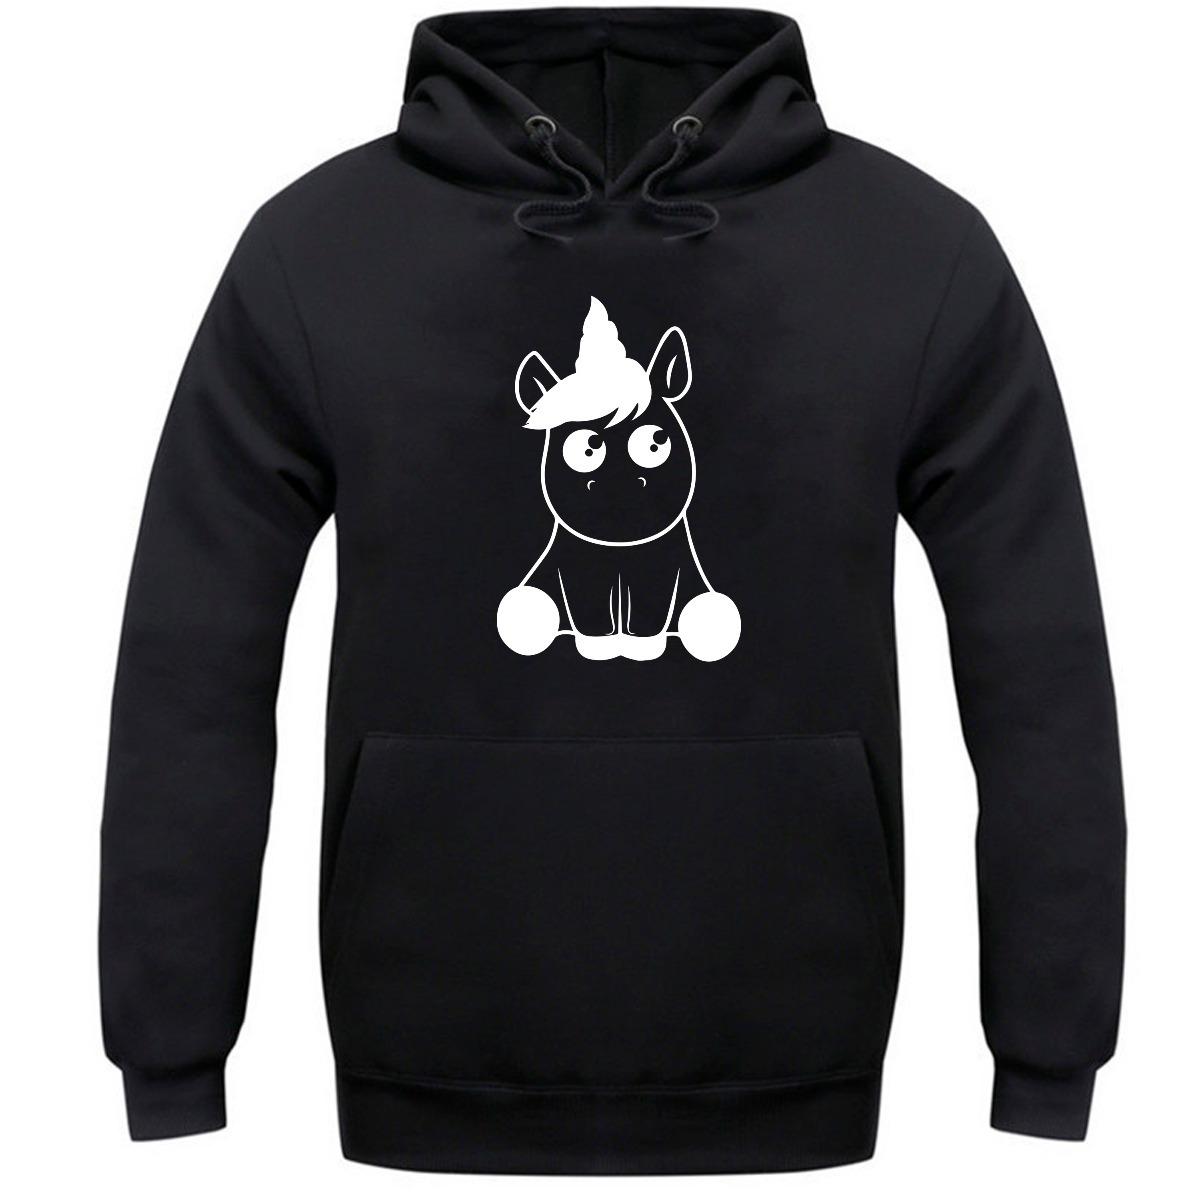 6d6688e25 moletom blusa unicornio preto casaco tumblr de frio. Carregando zoom.